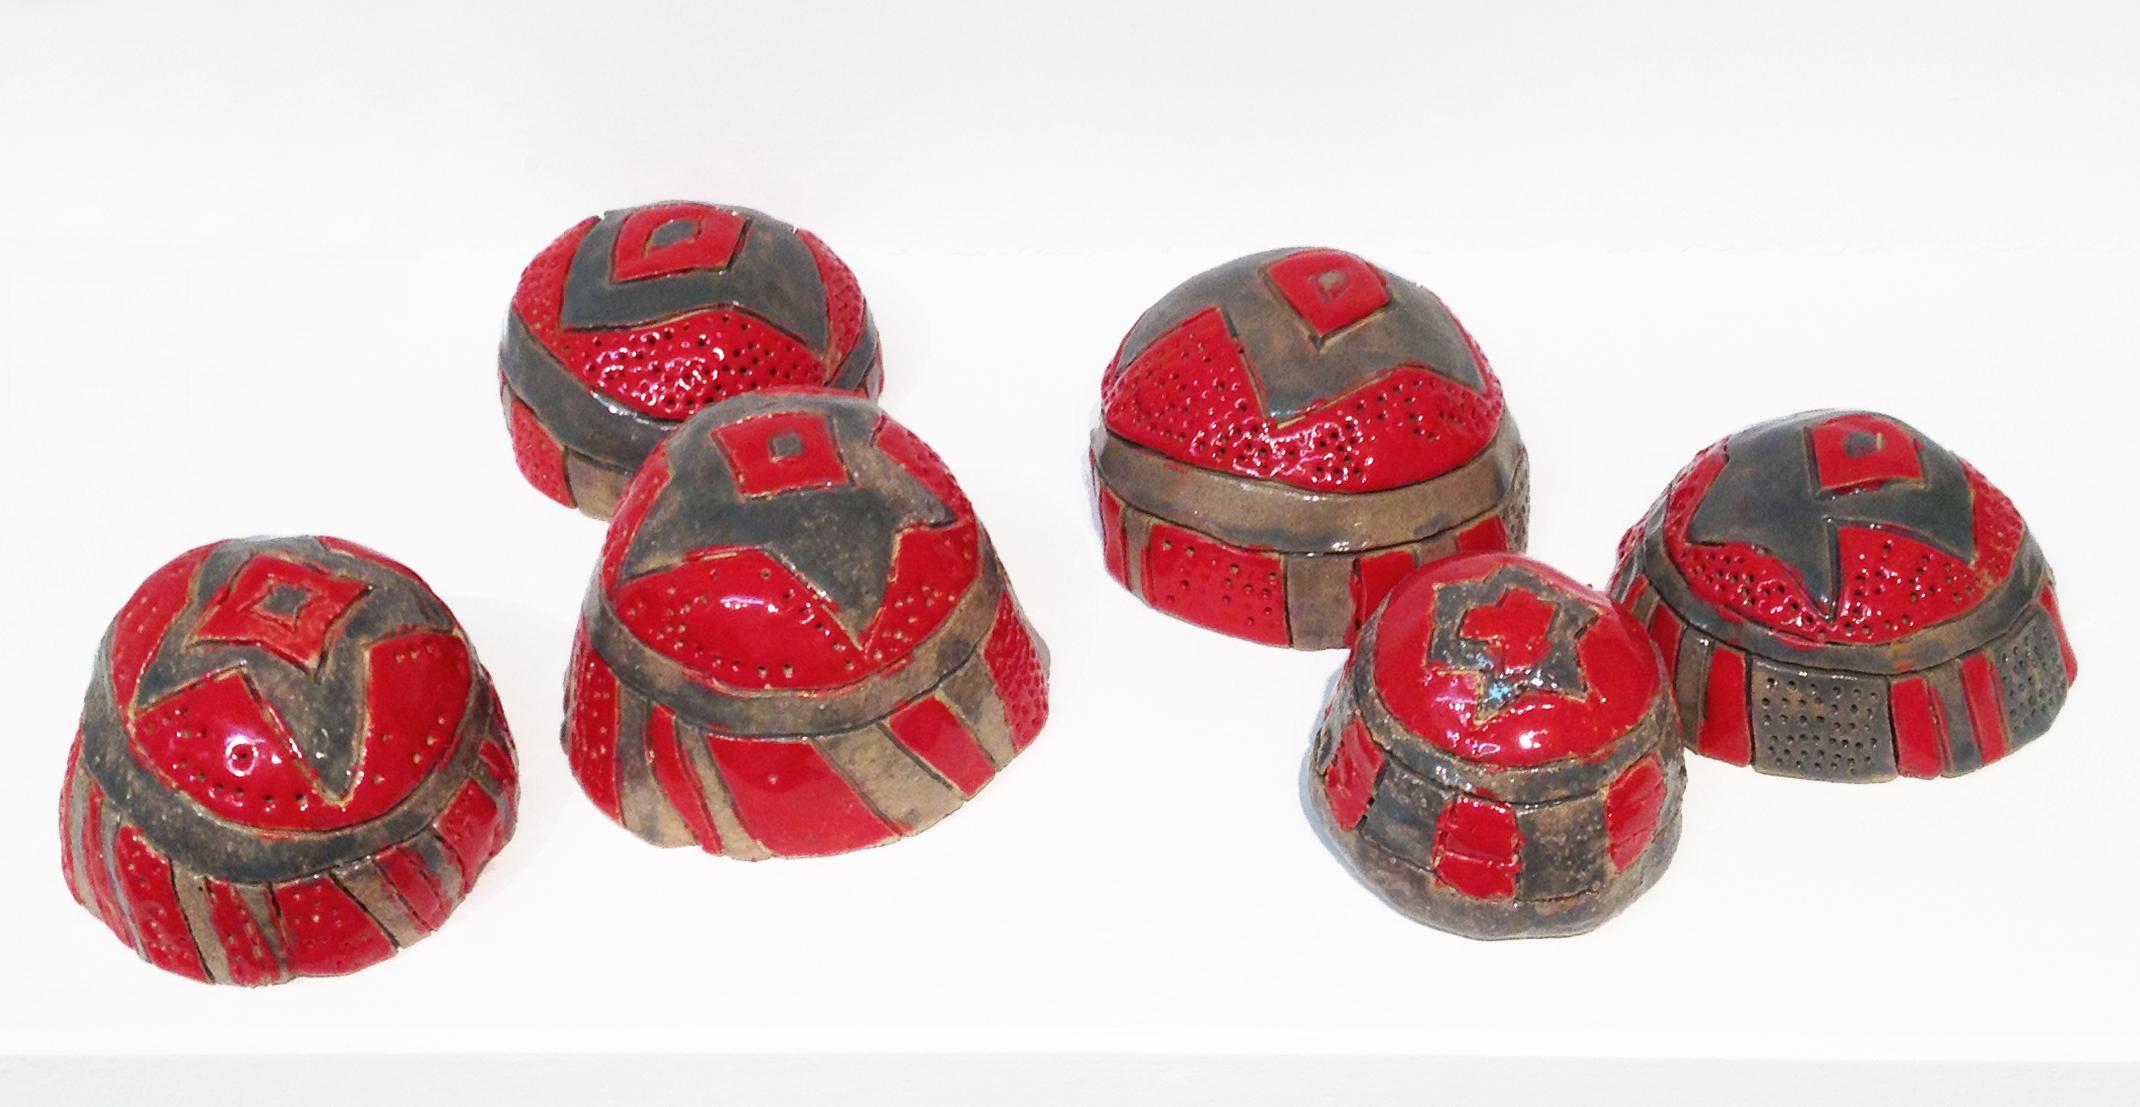 Artwork of the Week – 'Tunnock's Tea Cakes' by Cameron Morgan